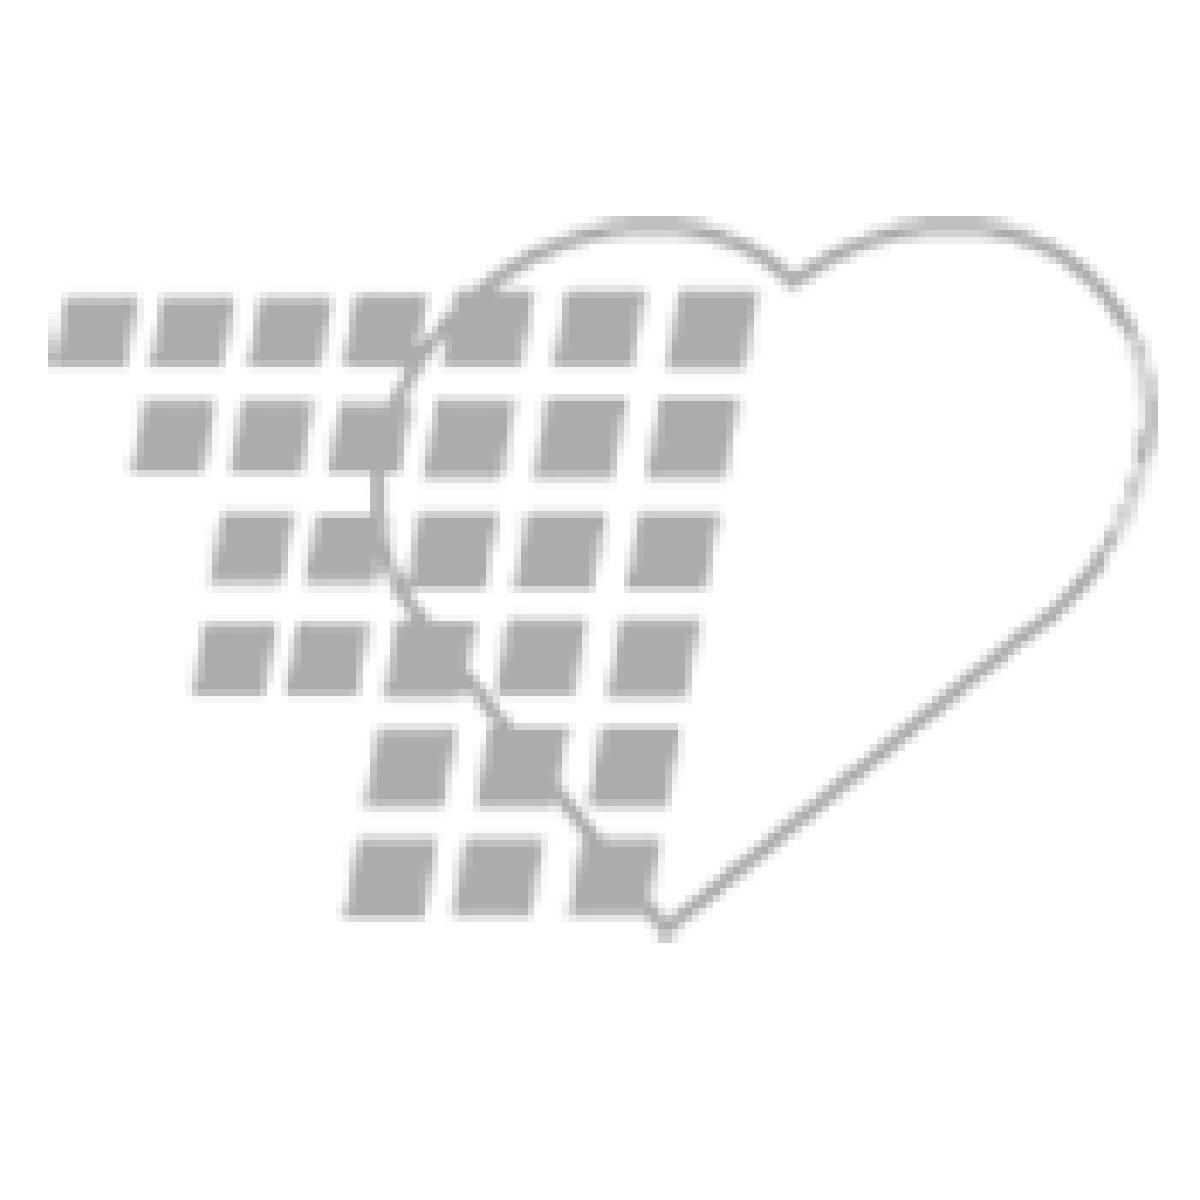 03-47-6100 Innovative Healthcare Corporation NitriDerm® Sterile Pairs Powder-Free Nitrile Gloves